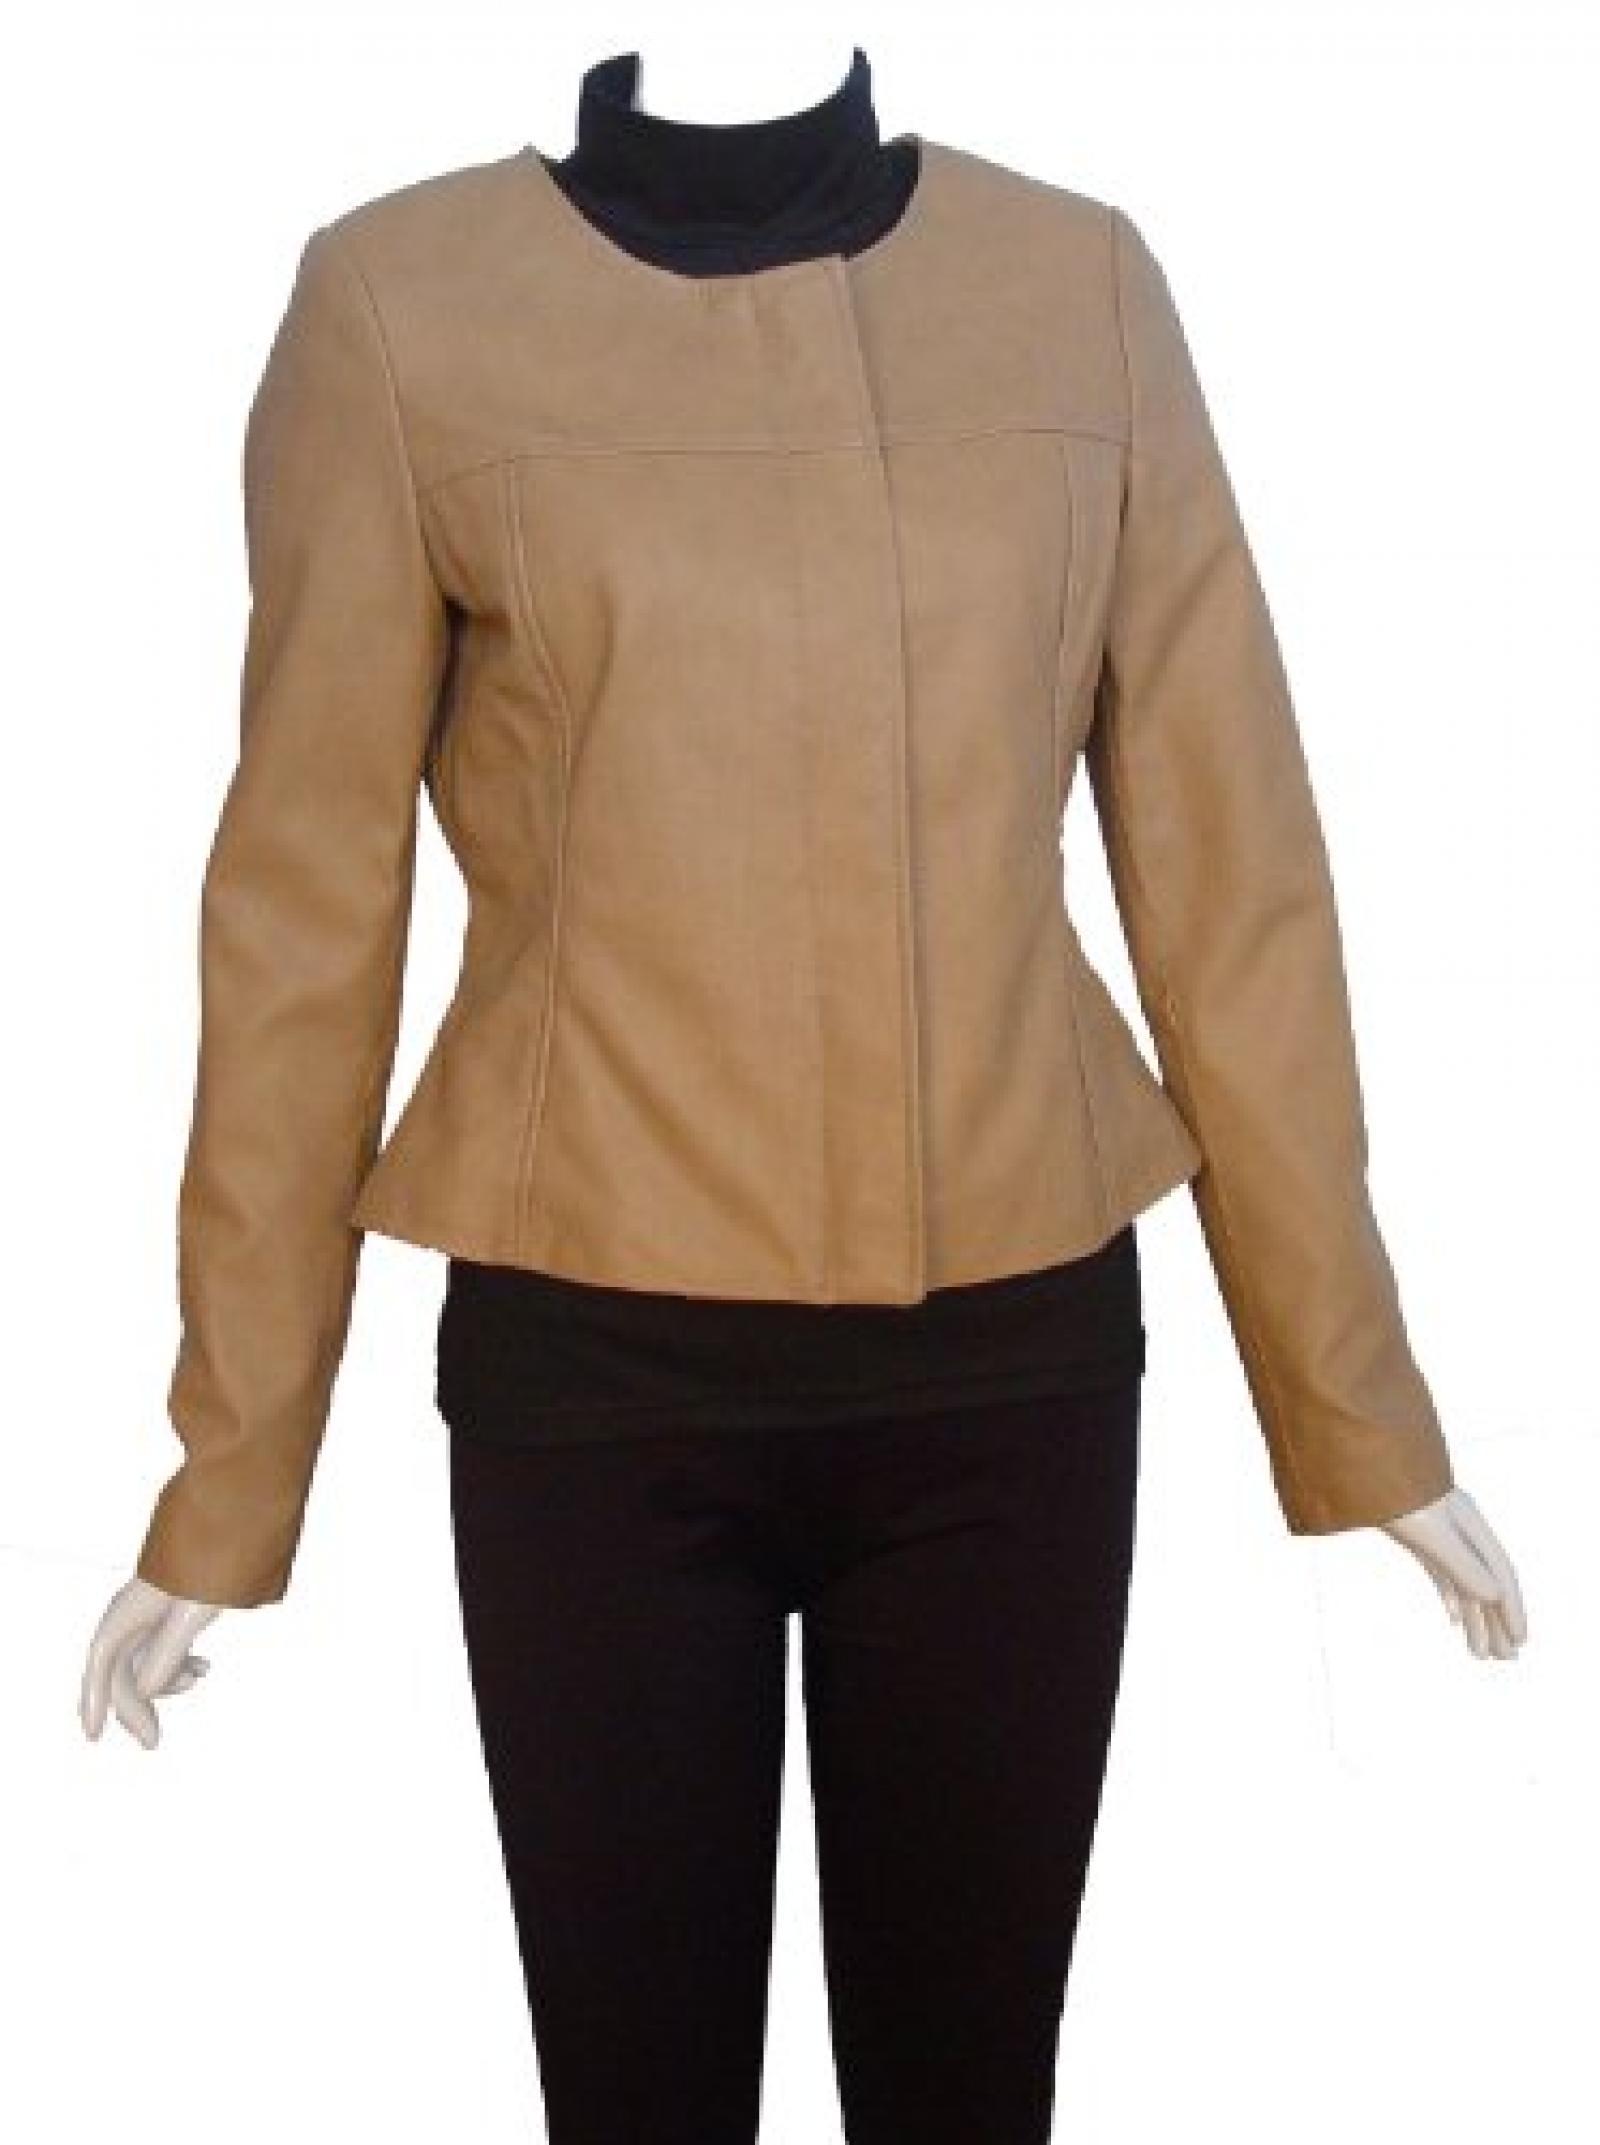 Nettailor FREE tailoring Women PETITE SZ 4066 Leather Moto Jacket Collarless